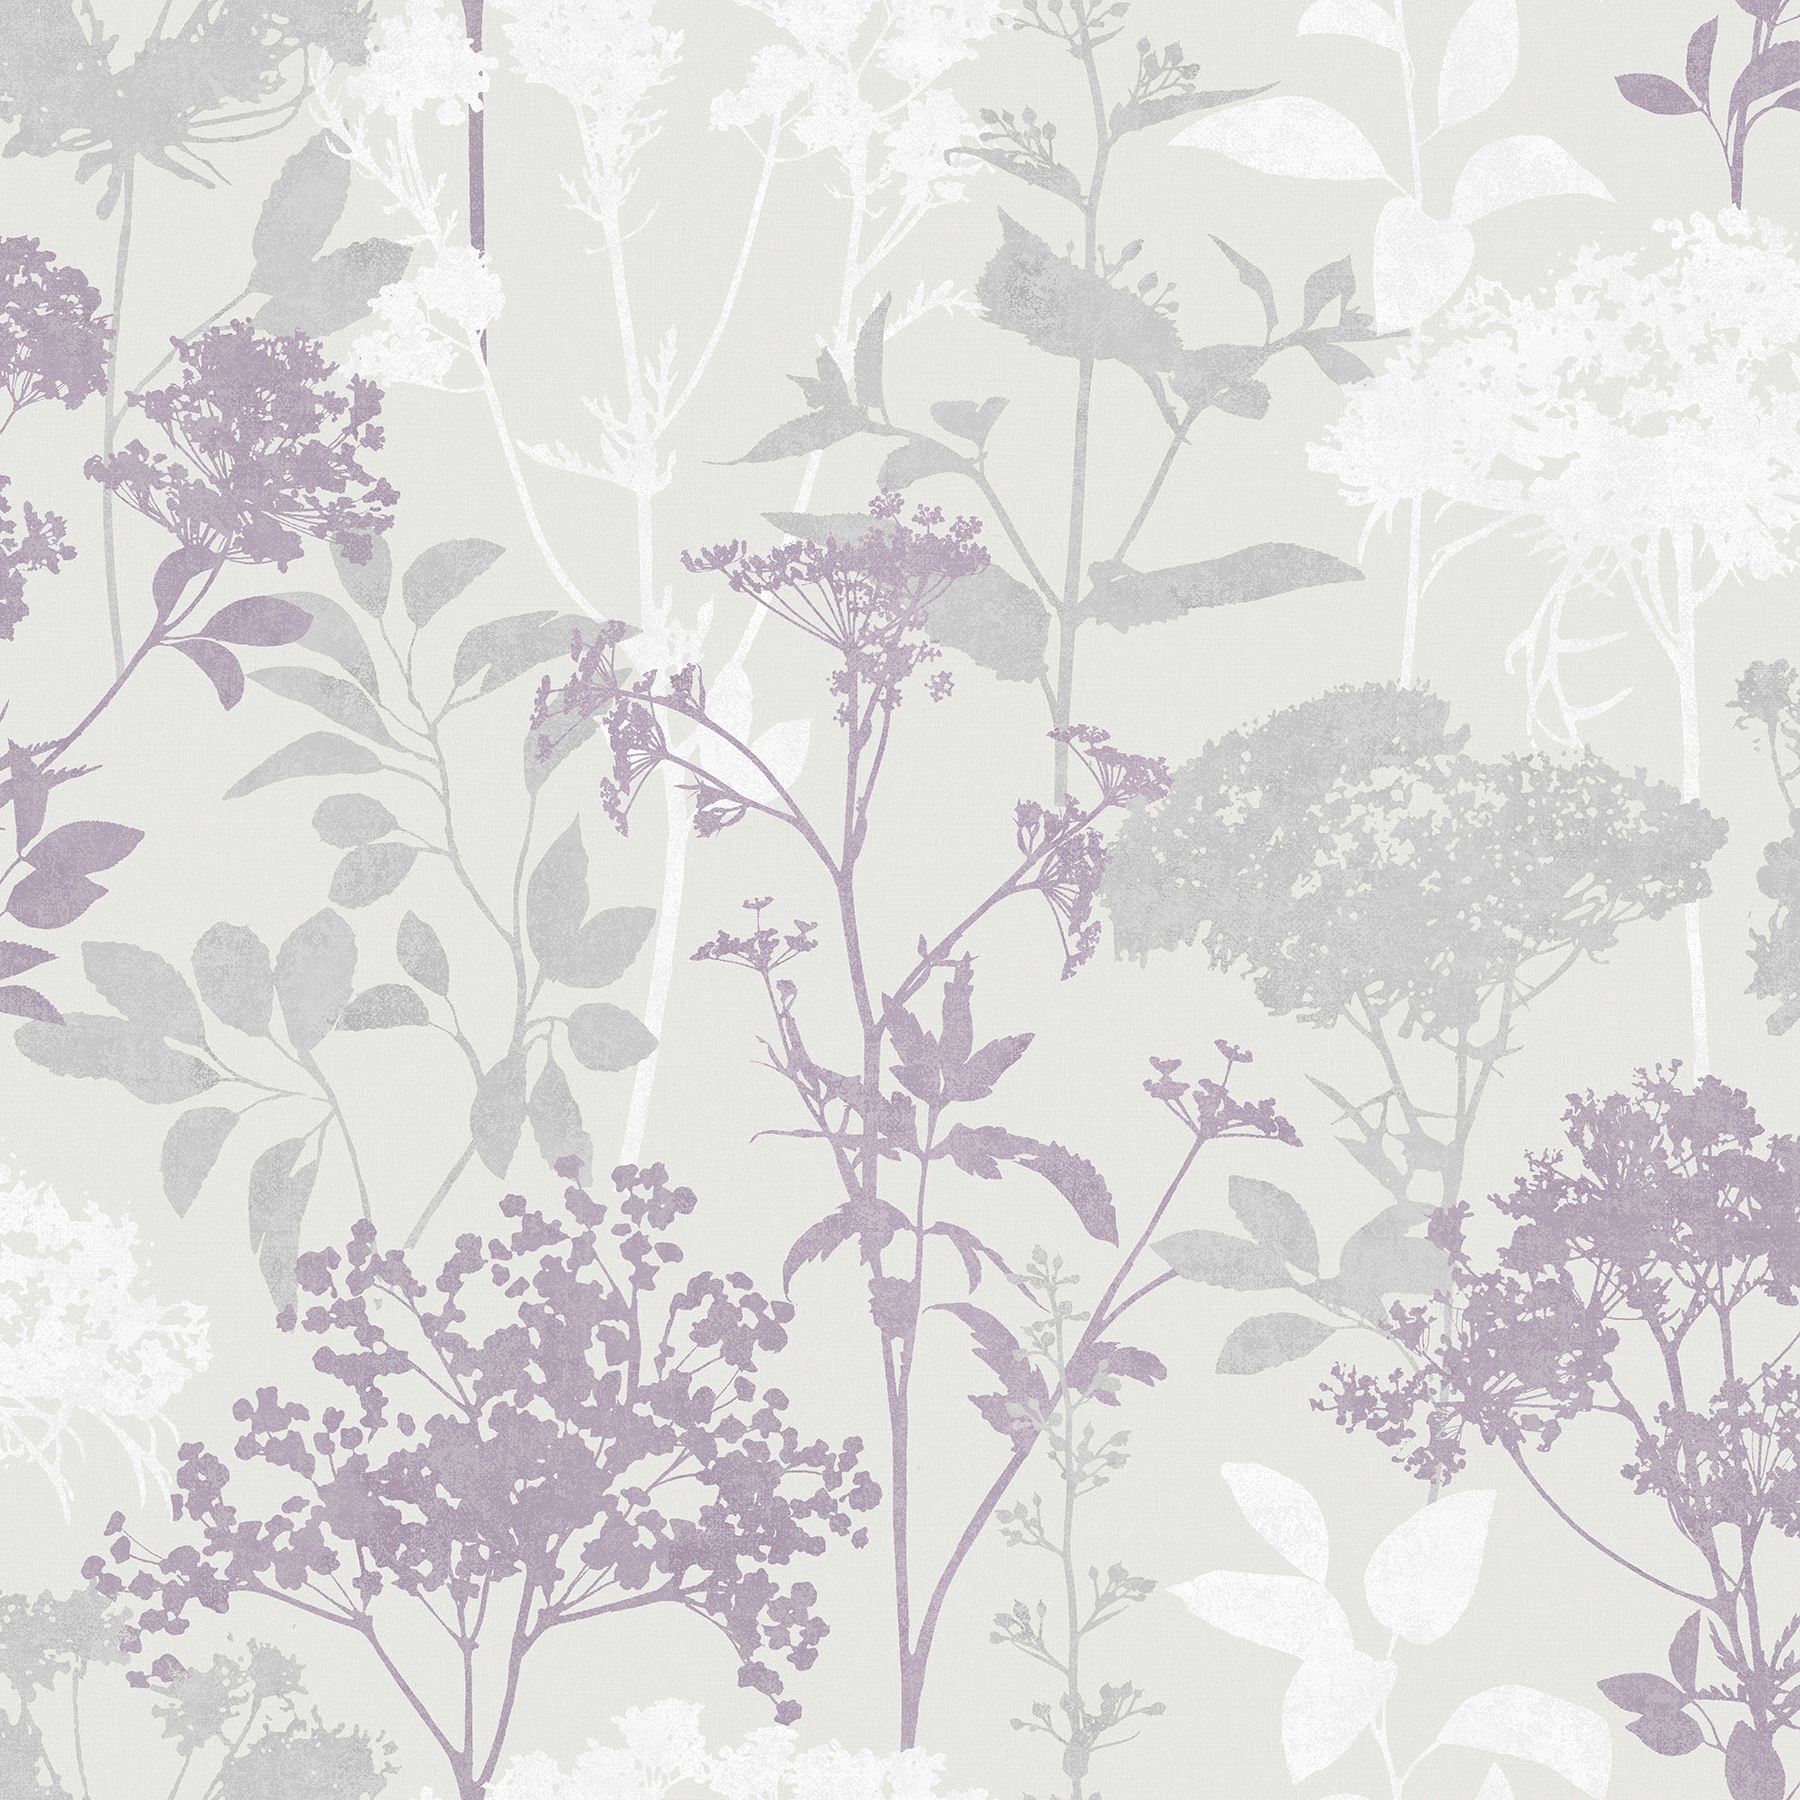 Picture of Brassia Lavender Silhouette Floral Wallpaper